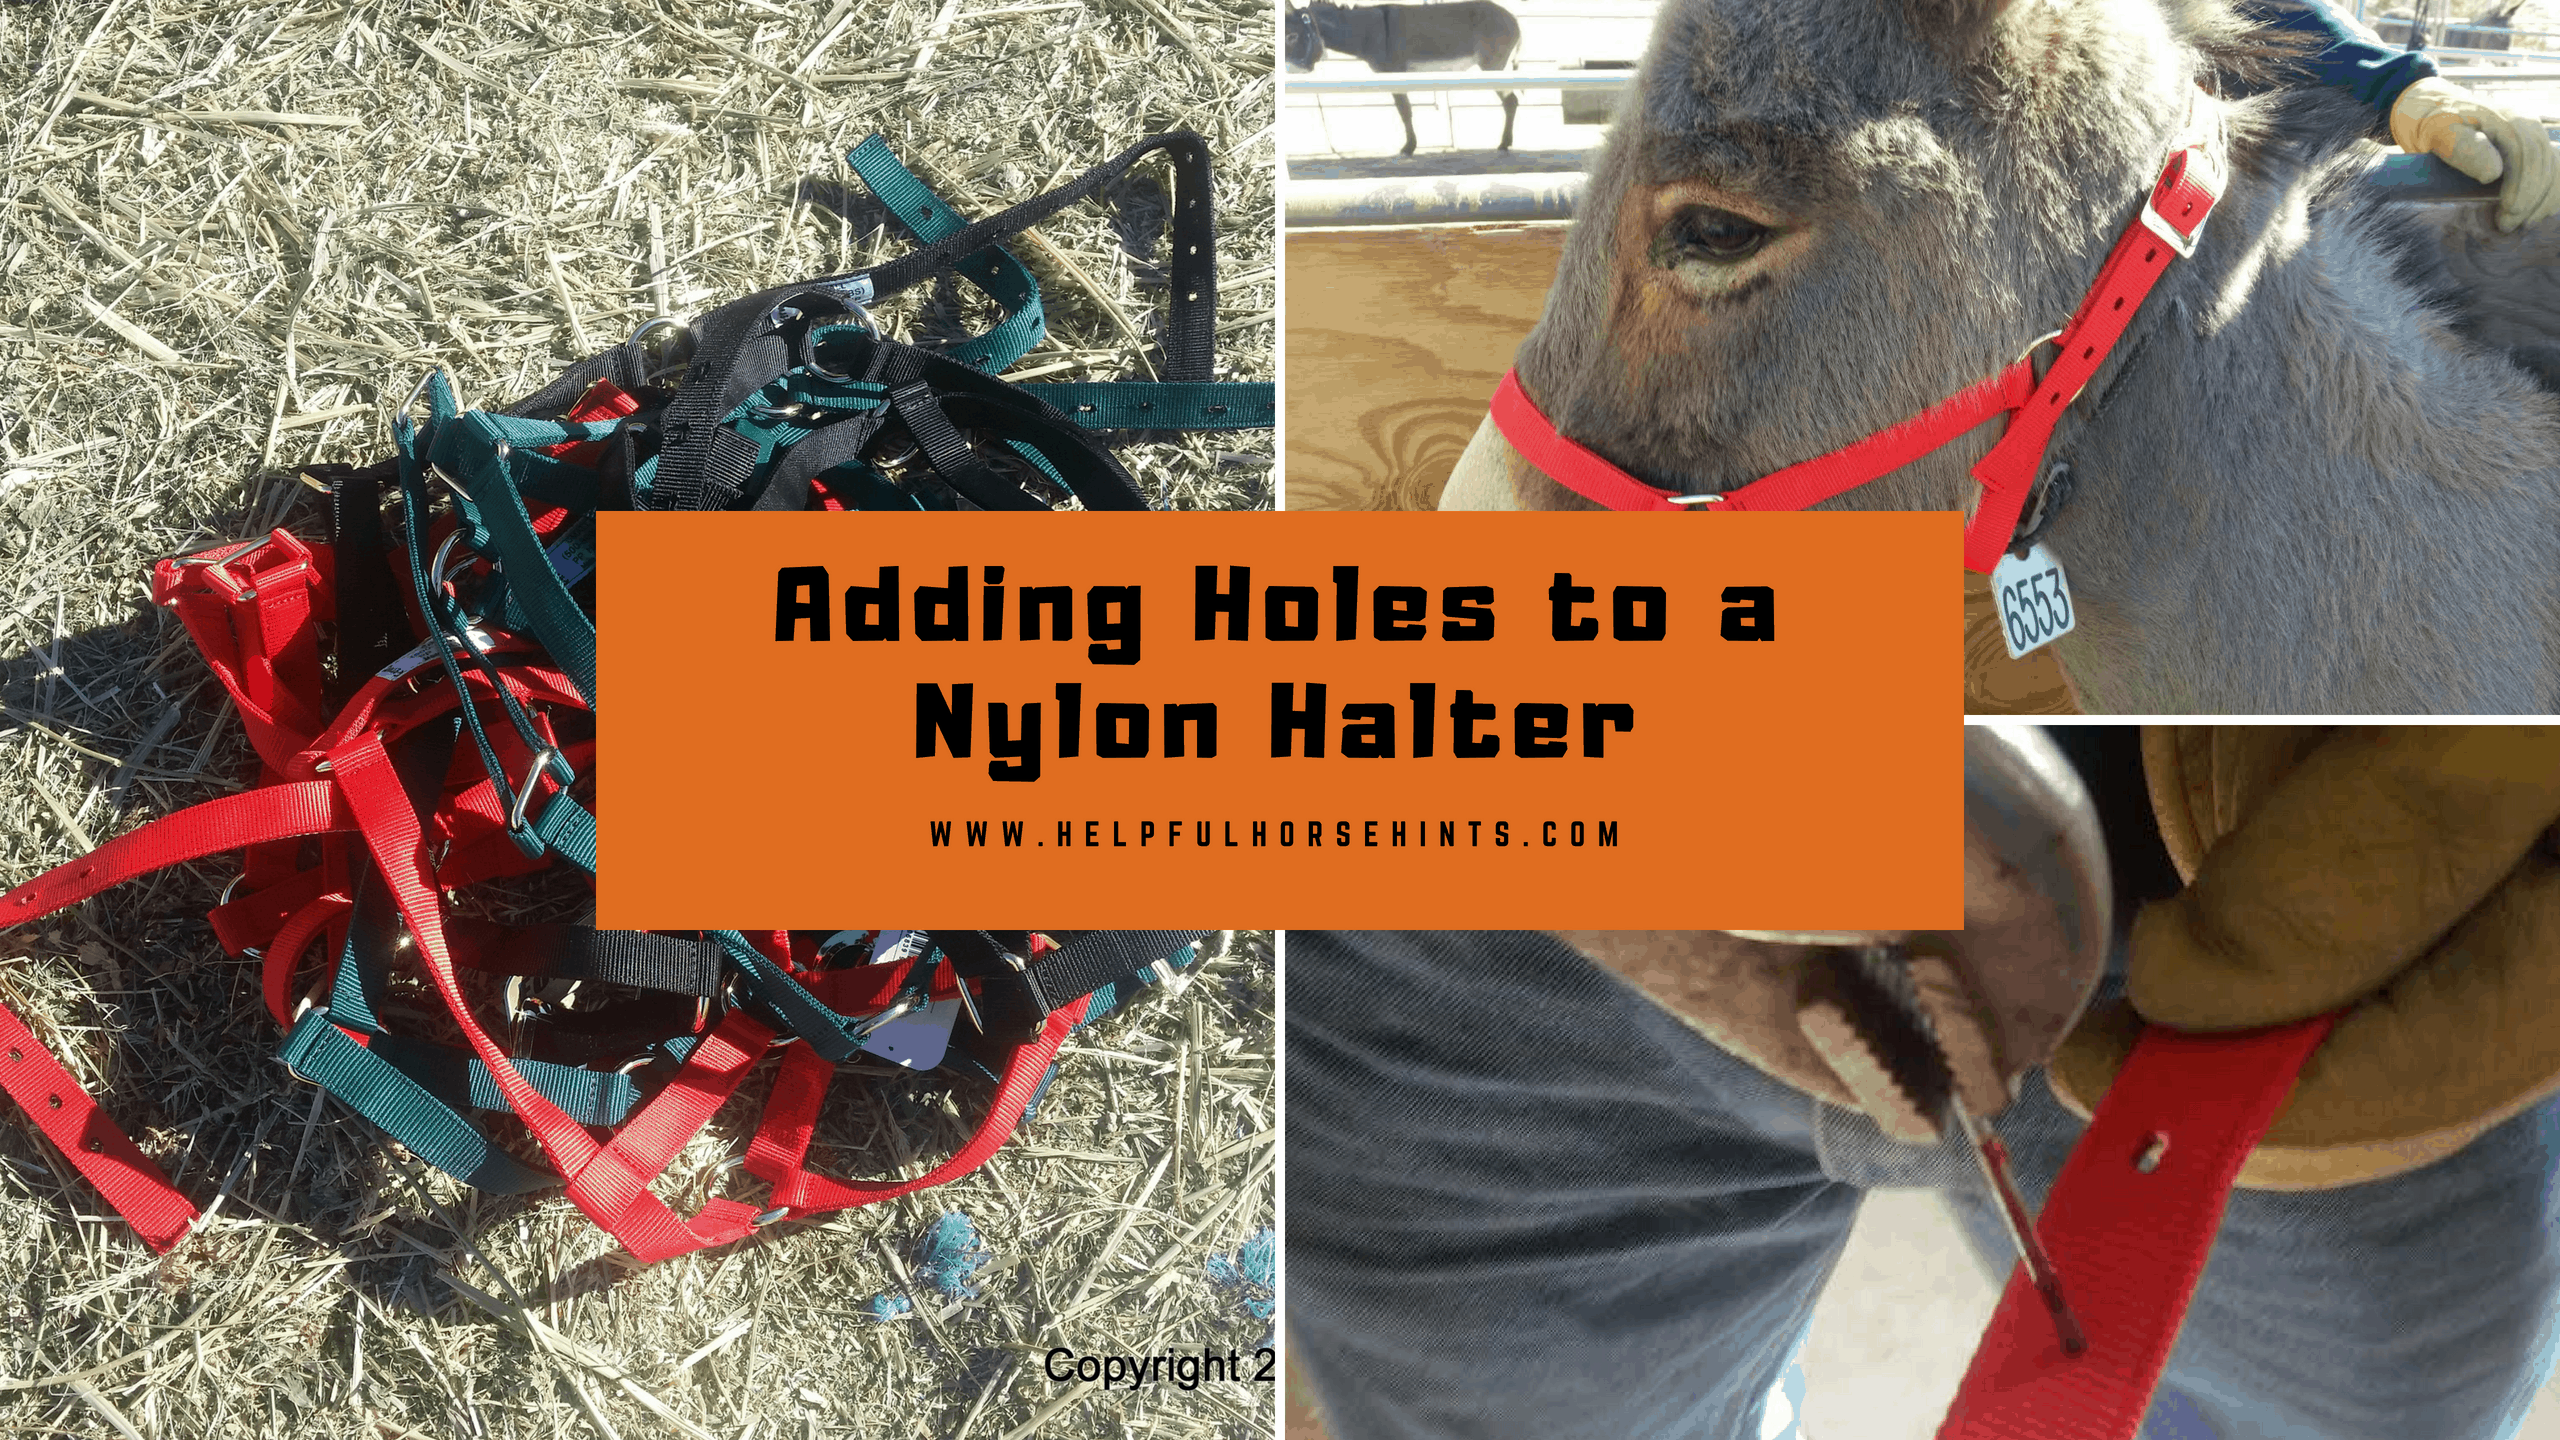 Adding Holes to a Nylon Halter